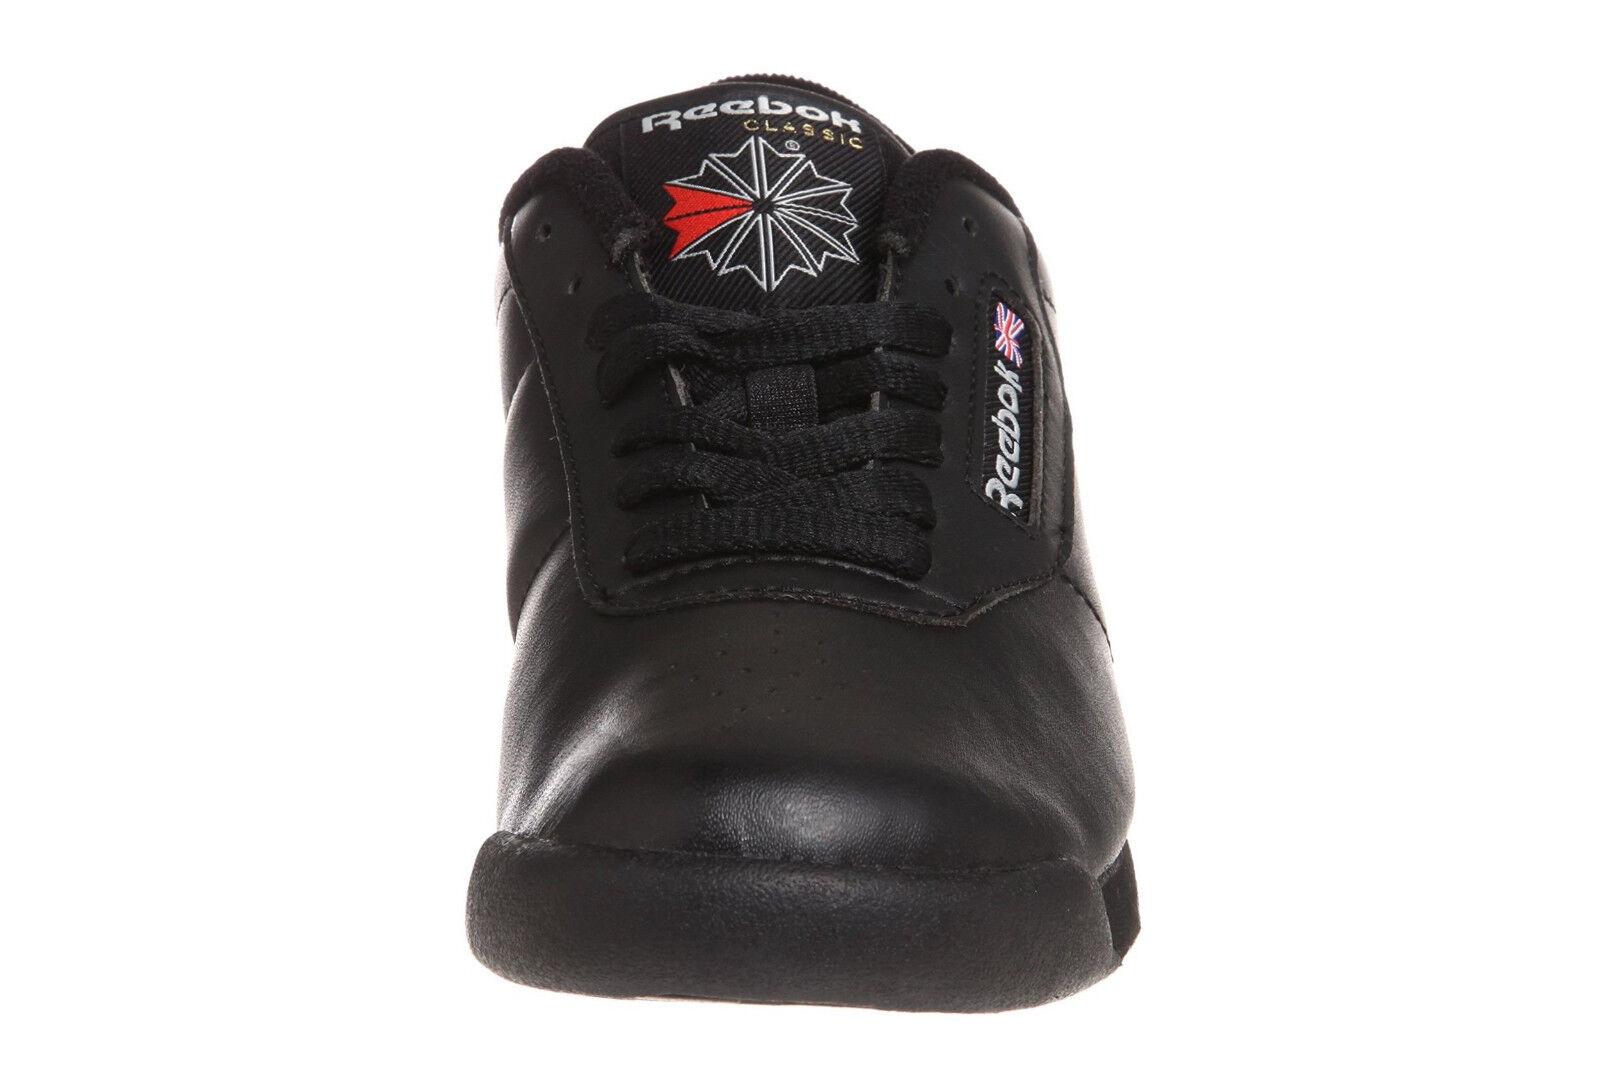 Reebok Classique Princesse Princesse Princesse Noir Femmes Courir Chaussures de Tennis b0db6e